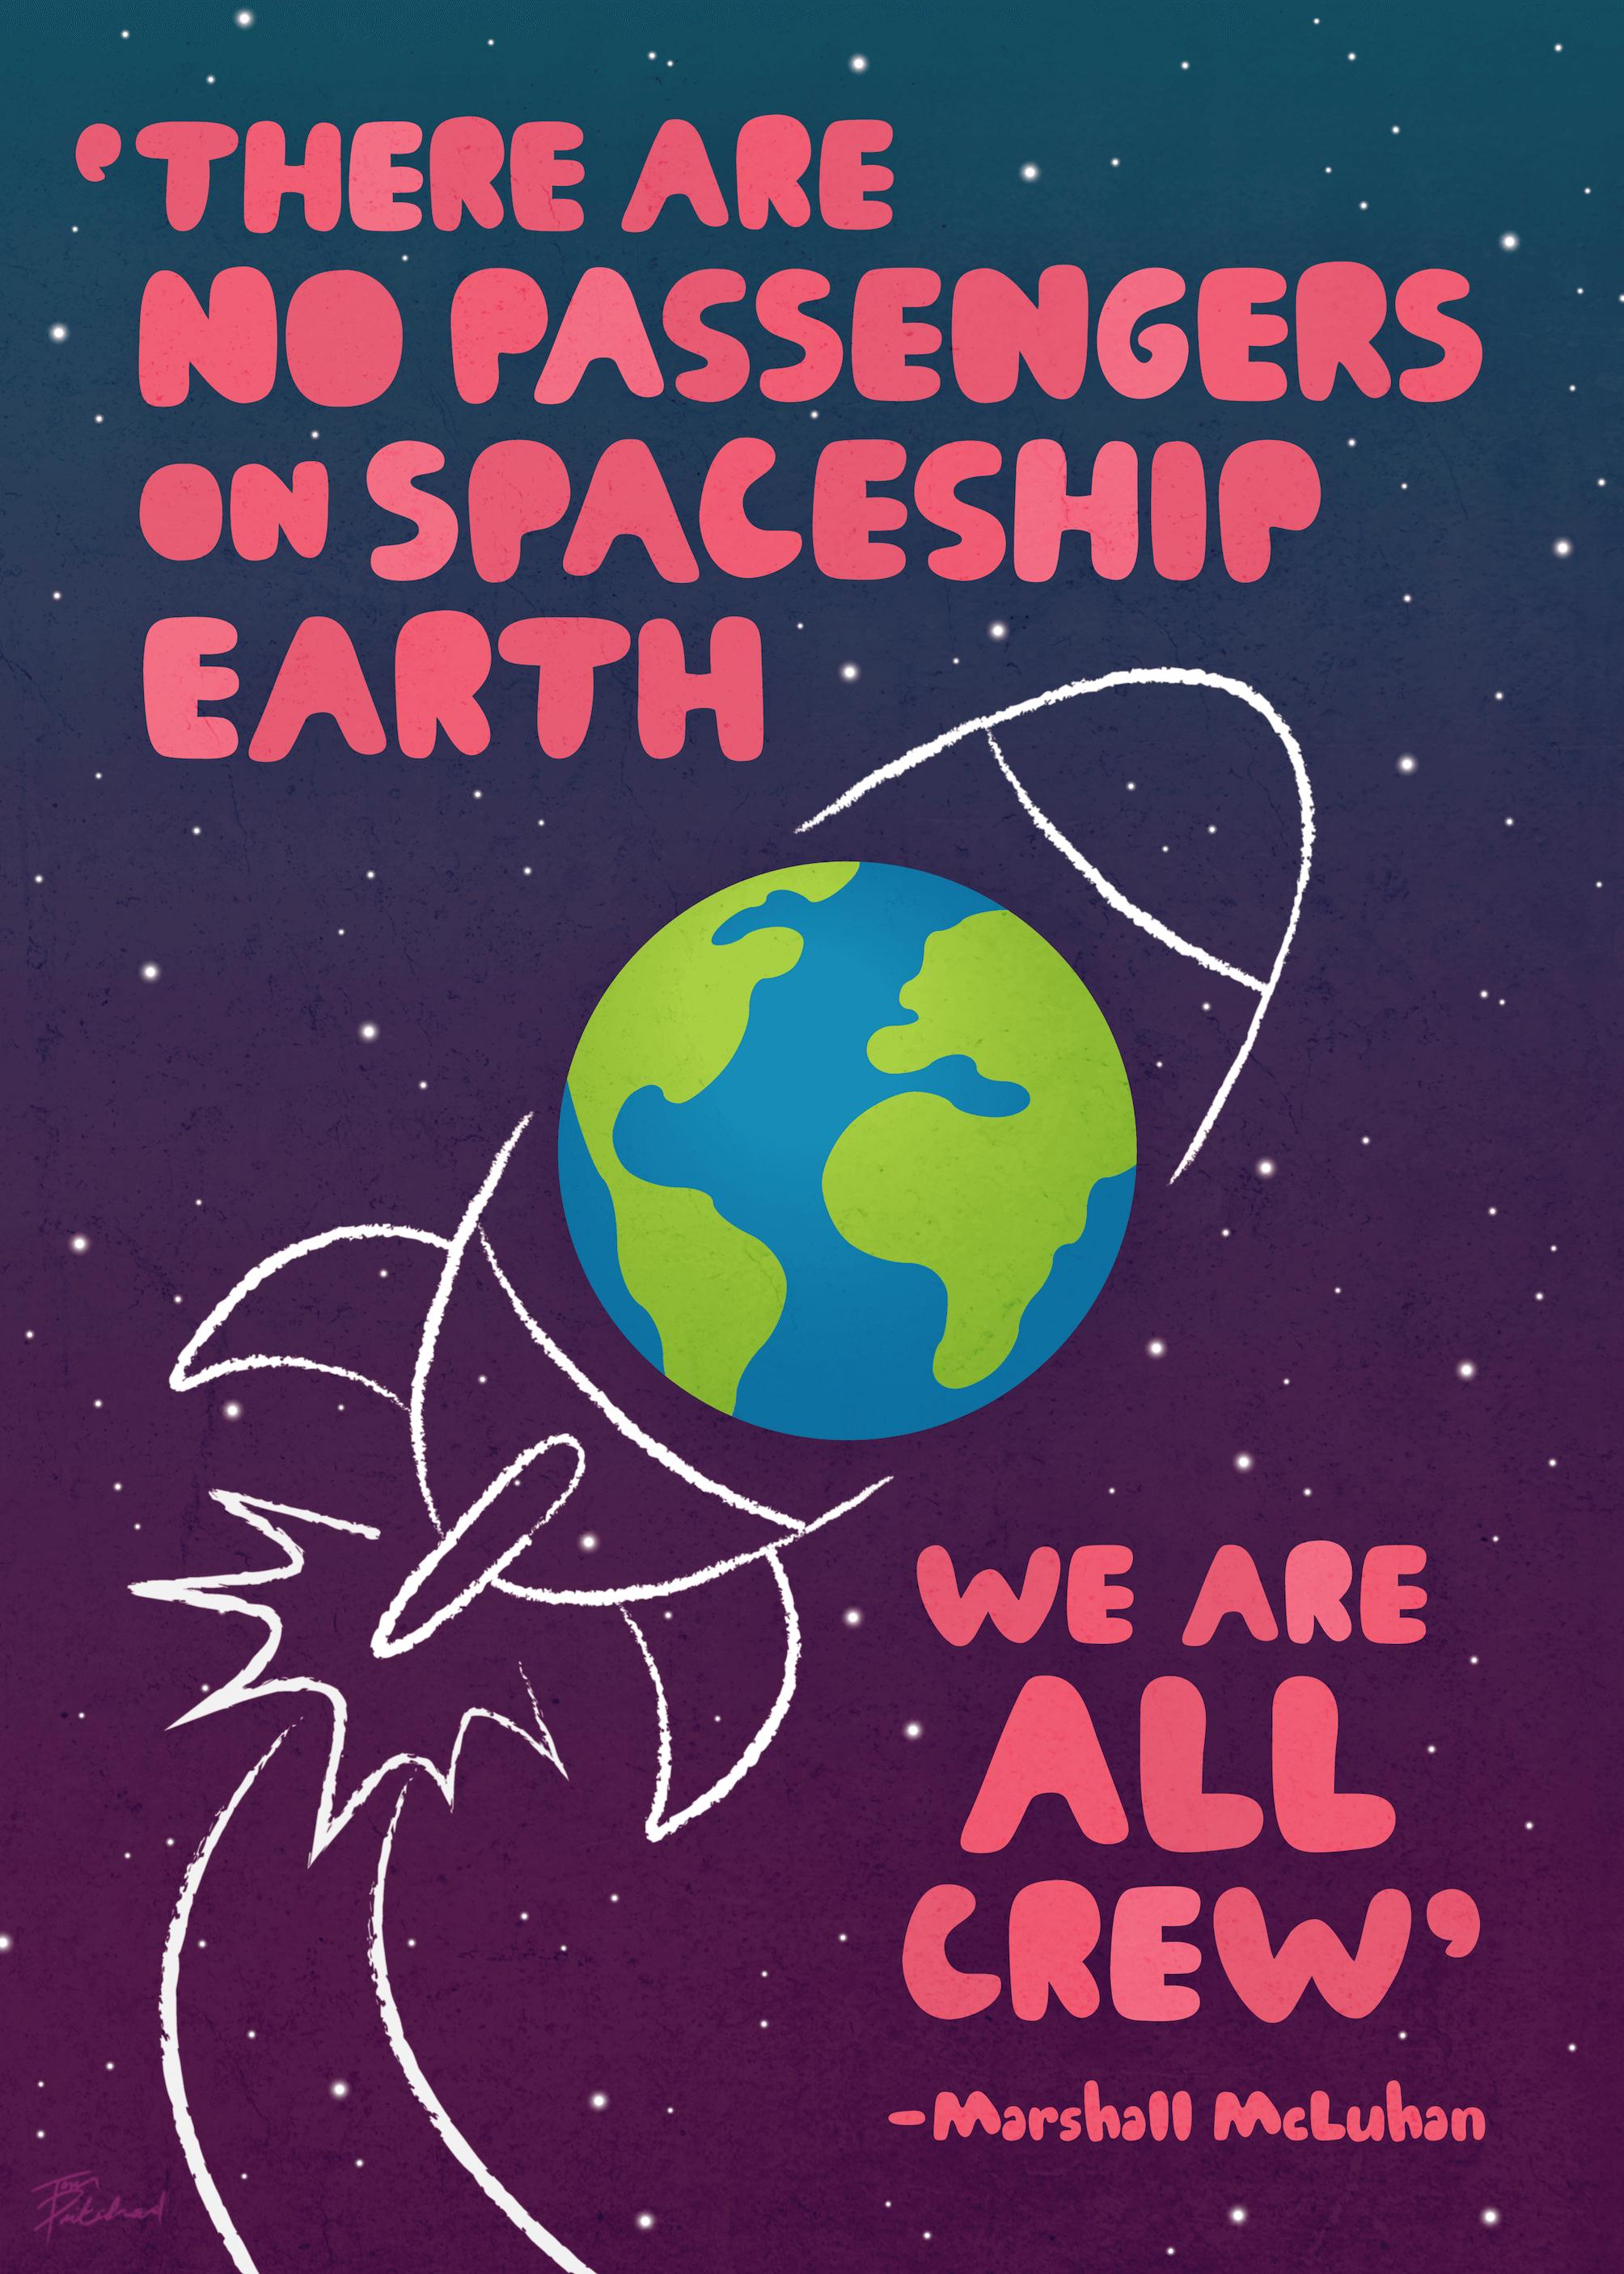 Spaceship Earth main image